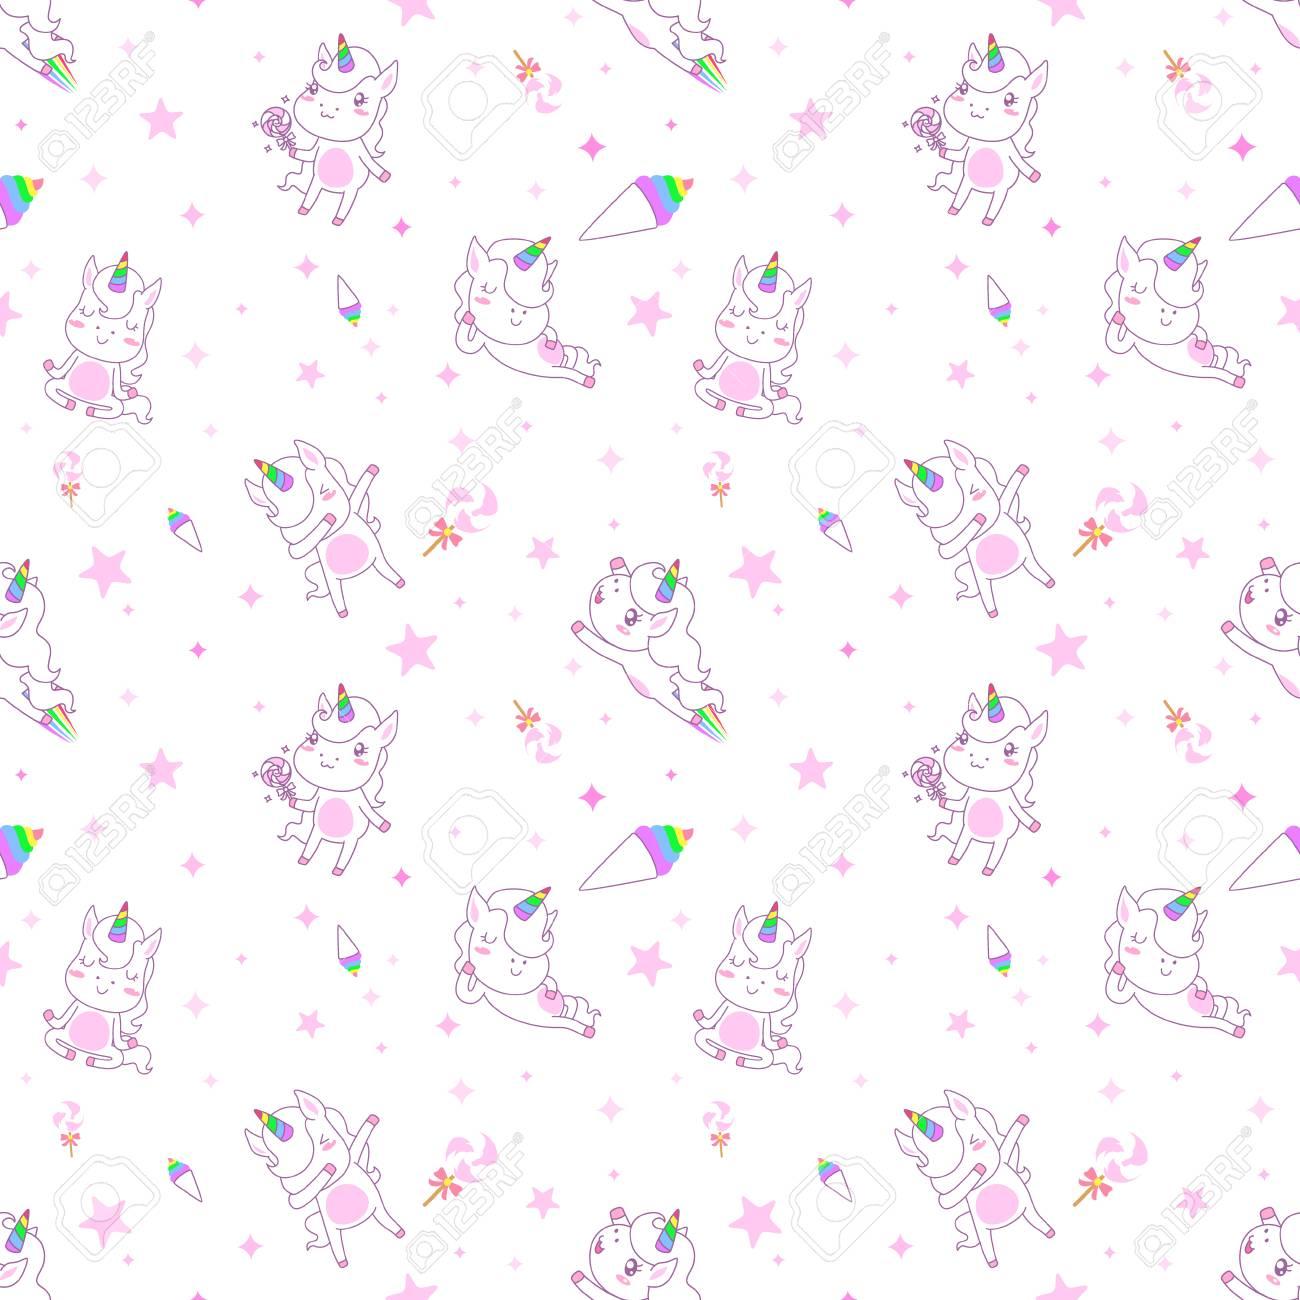 Cute Unicorn Seamless Pattern Vector Wallpaper